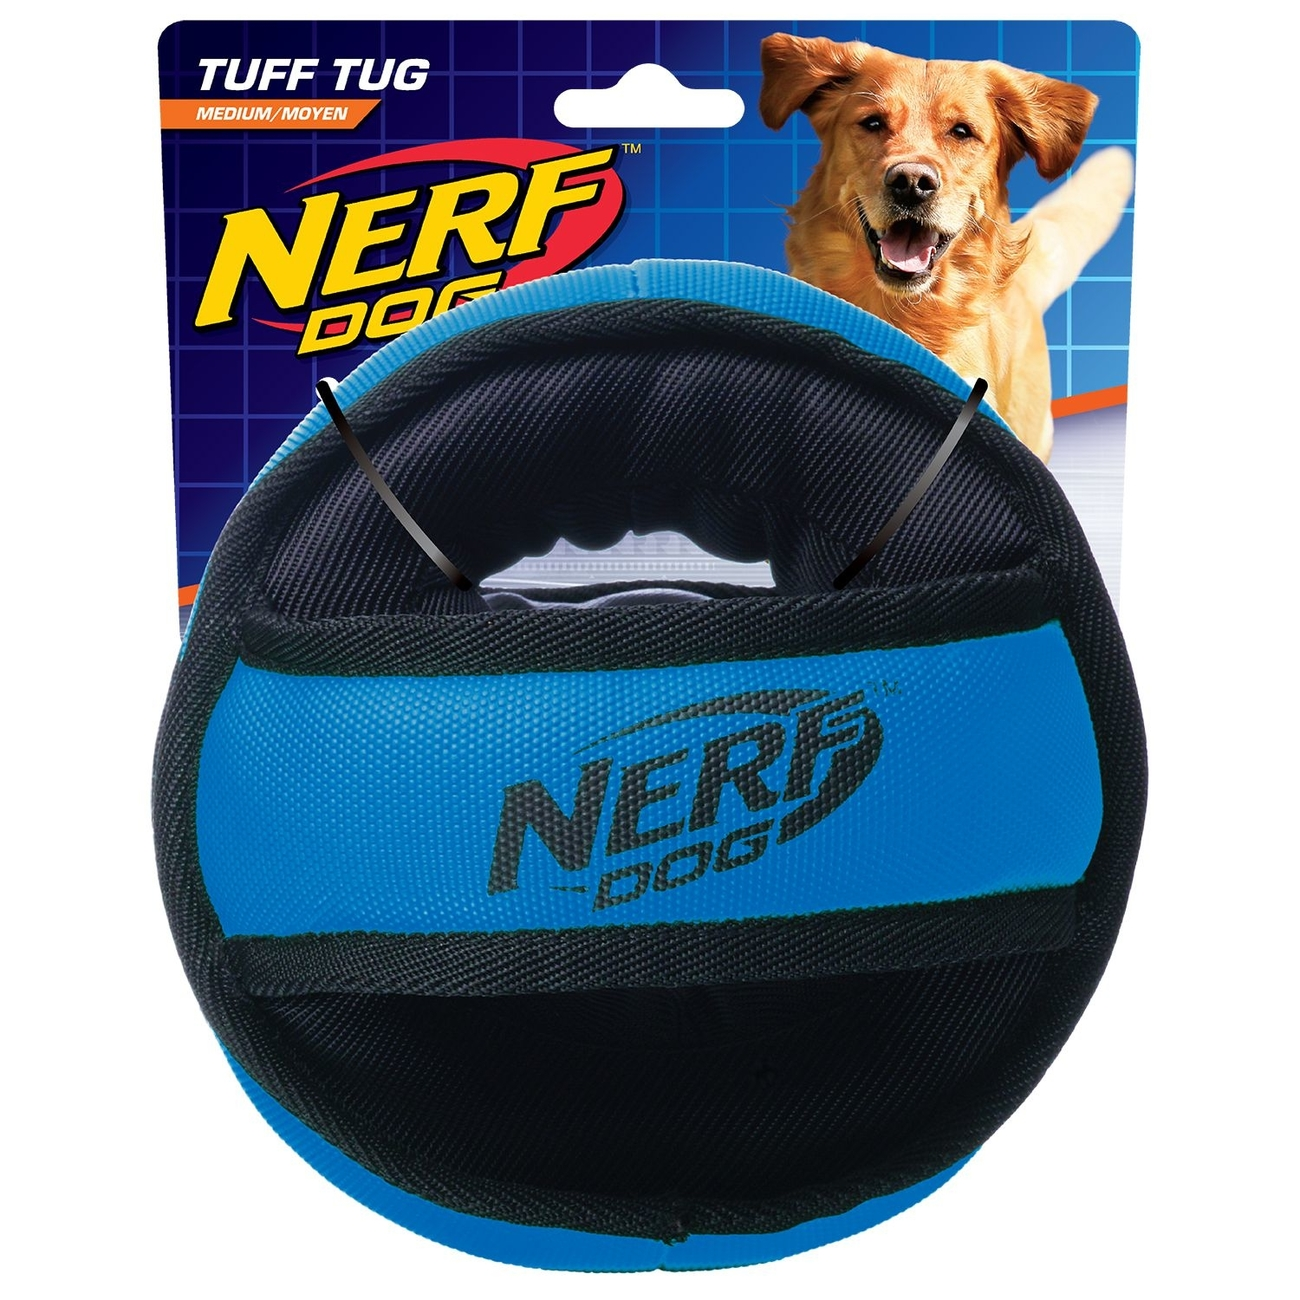 NERF Dog Plush - X-Ring